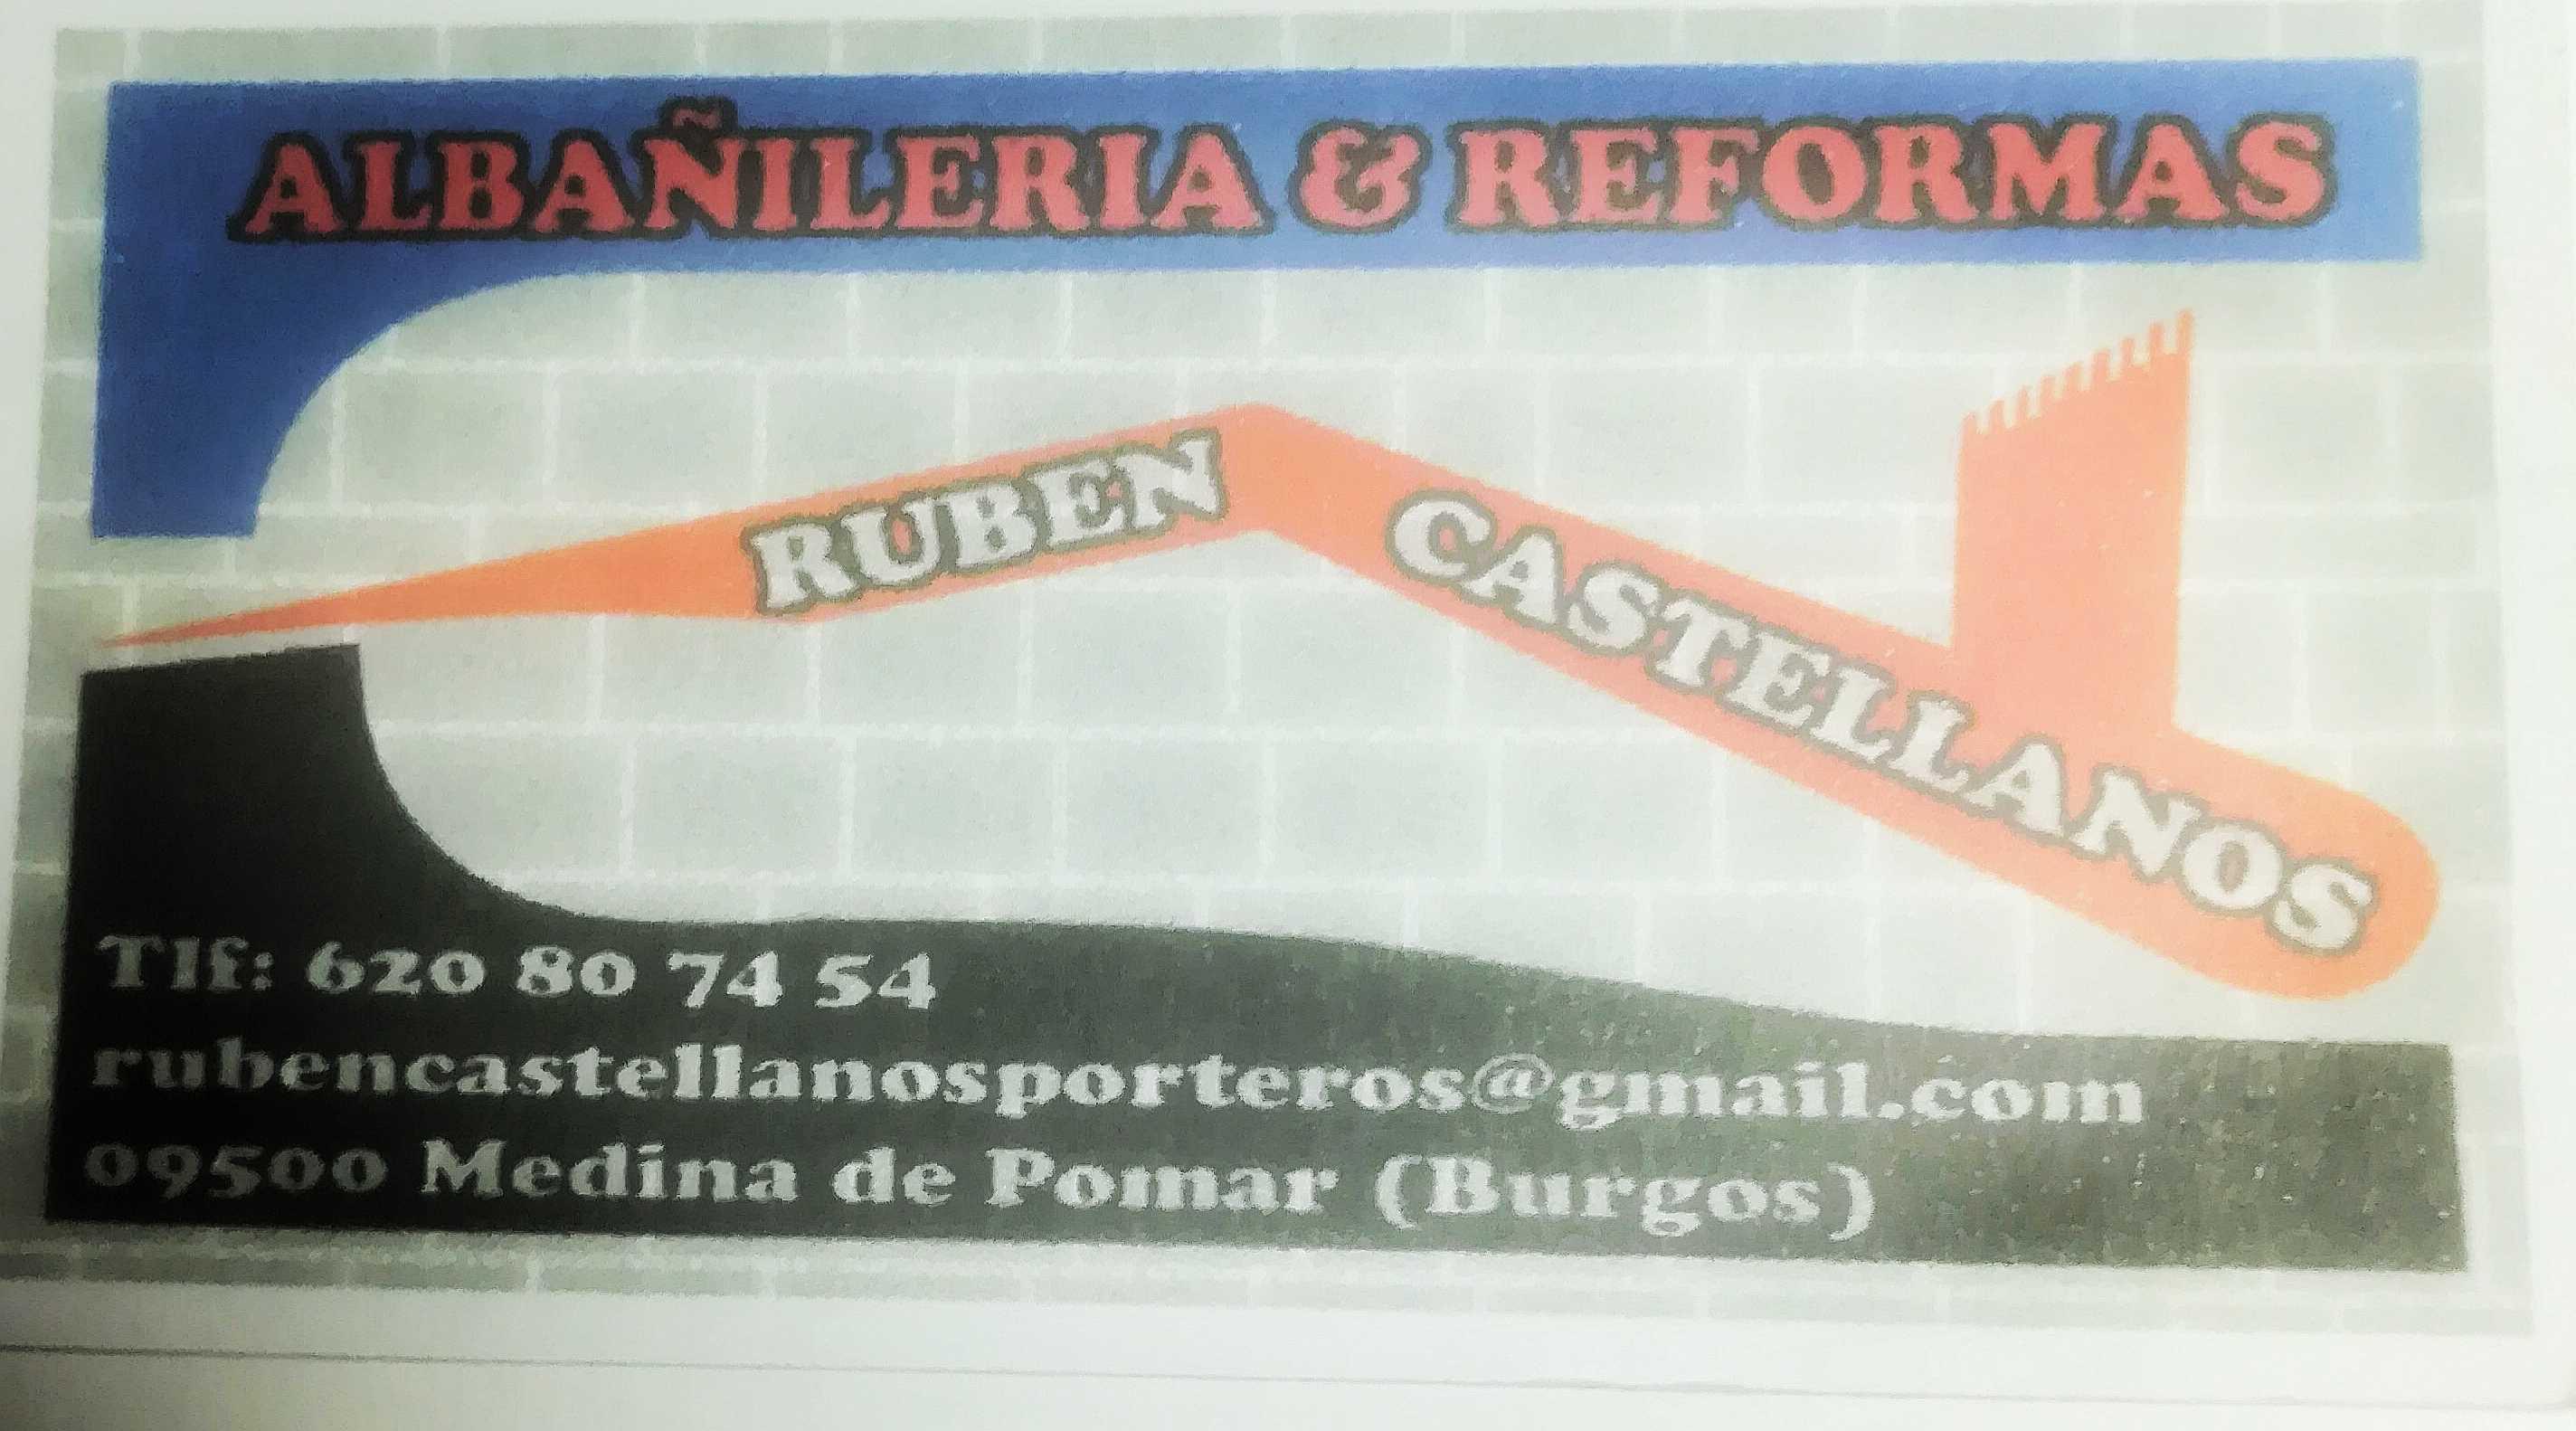 Ruben Castellanos Porteros